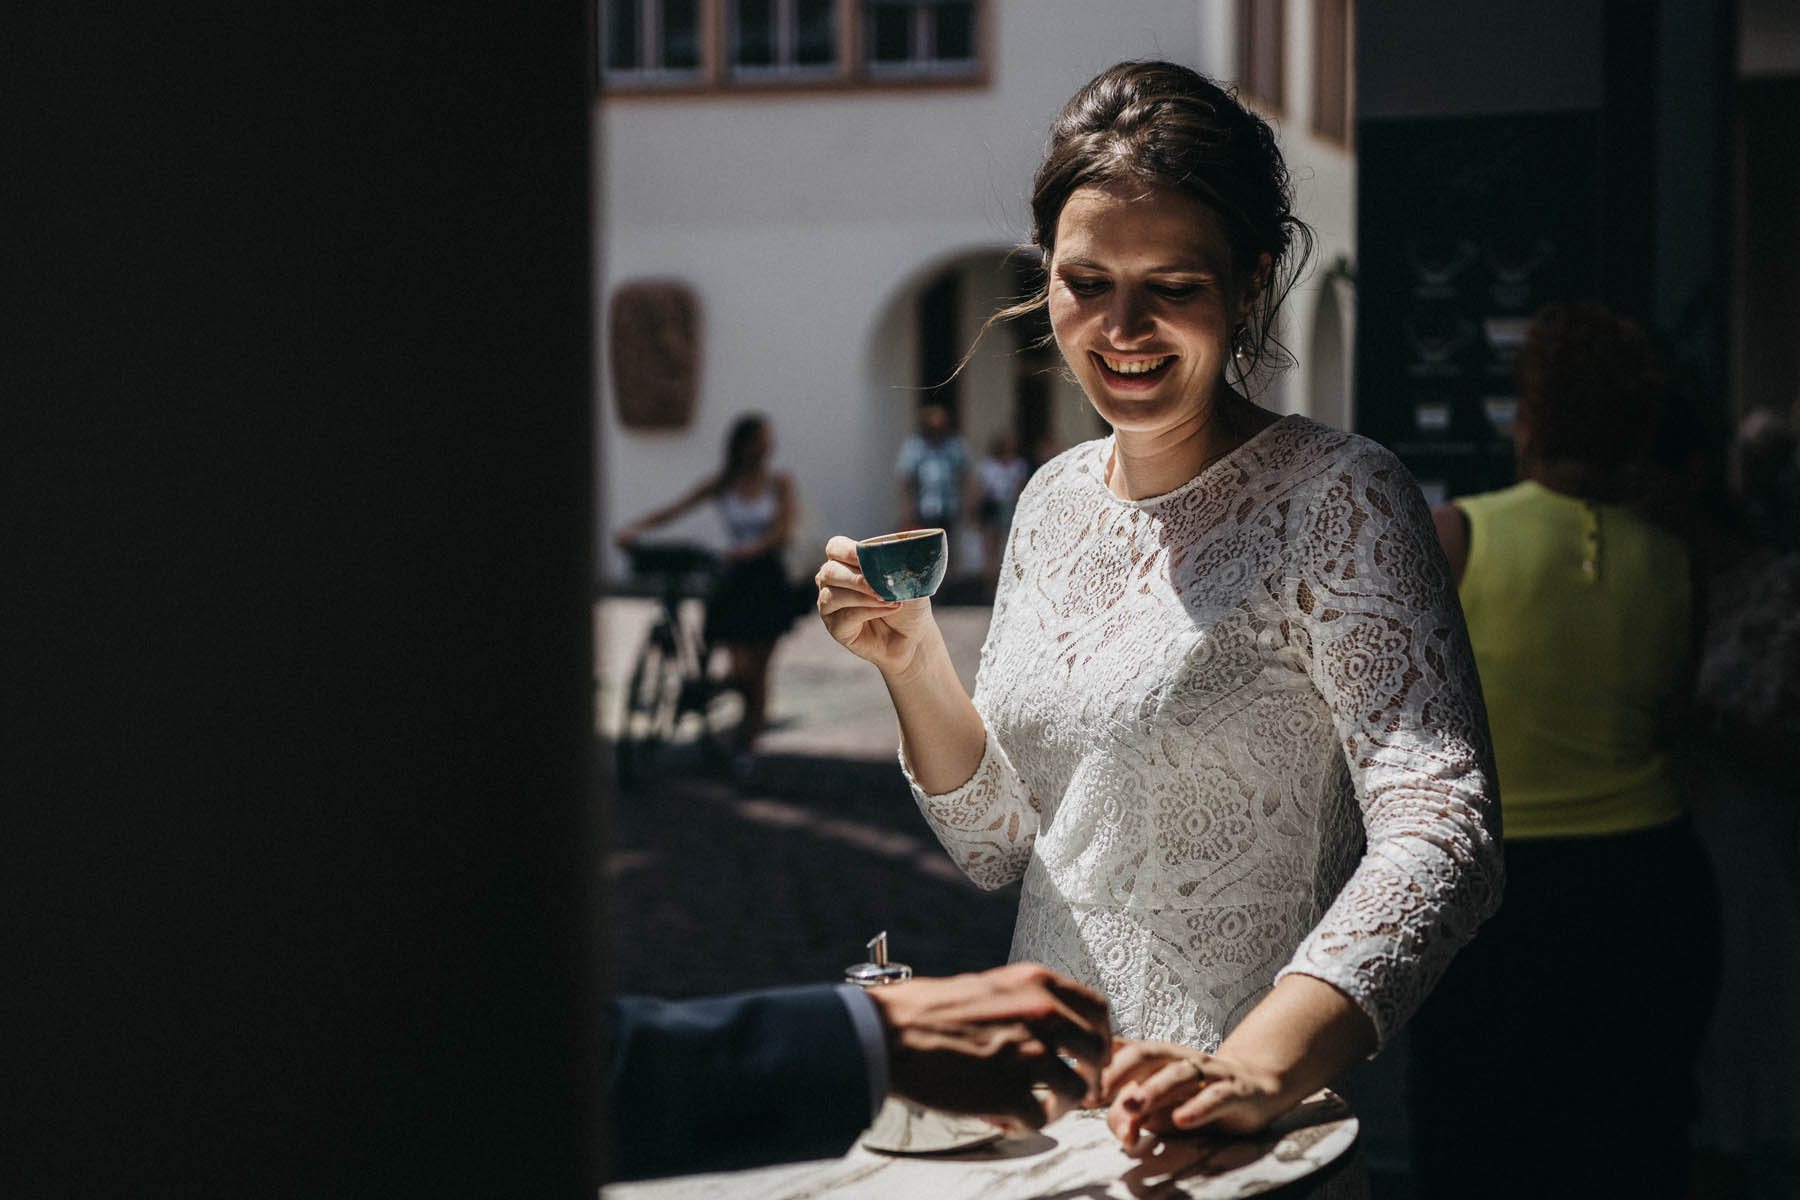 raissa simon fotografie elopement freiburg standesamt 032 - Julia + Tobias